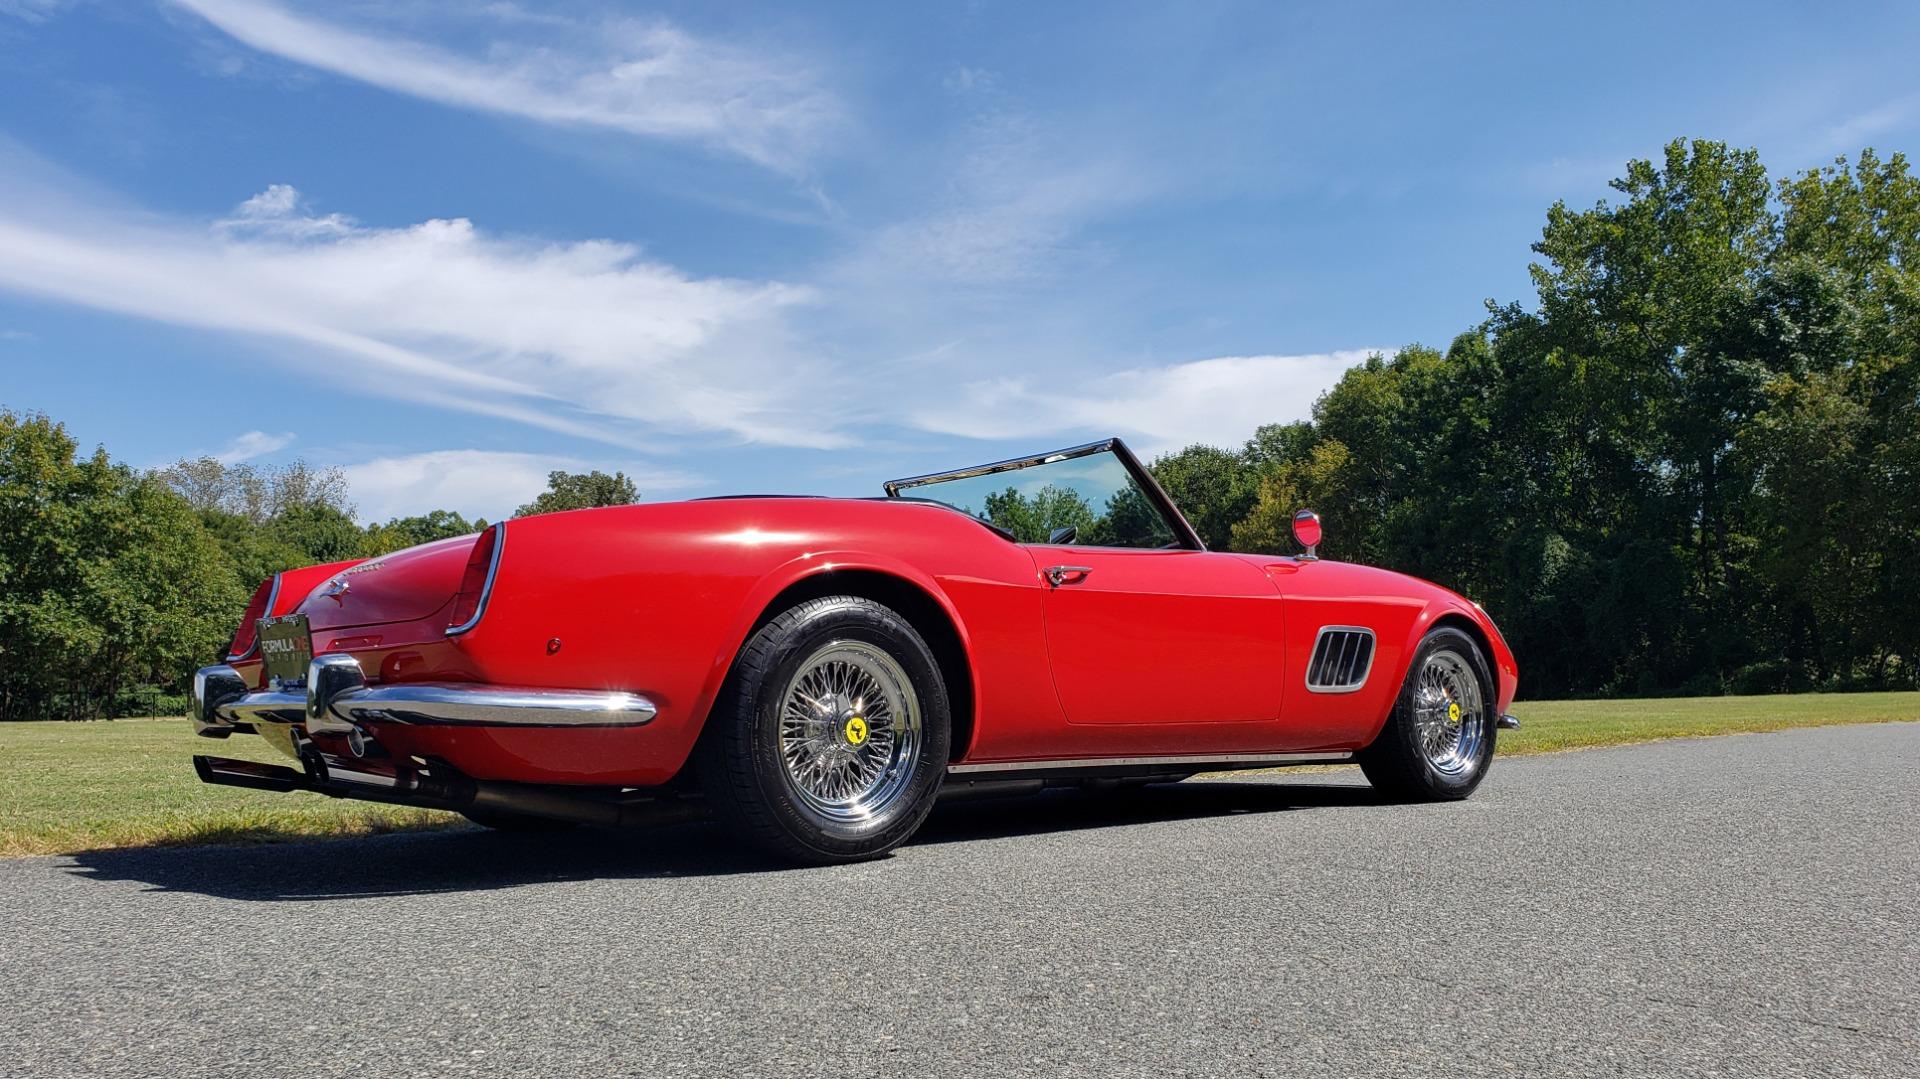 Used 1961 Ferrari 250GT SWB CALIFORNIA REPLICA / 302CI V8 / TREMEC 5-SPEED for sale Sold at Formula Imports in Charlotte NC 28227 24